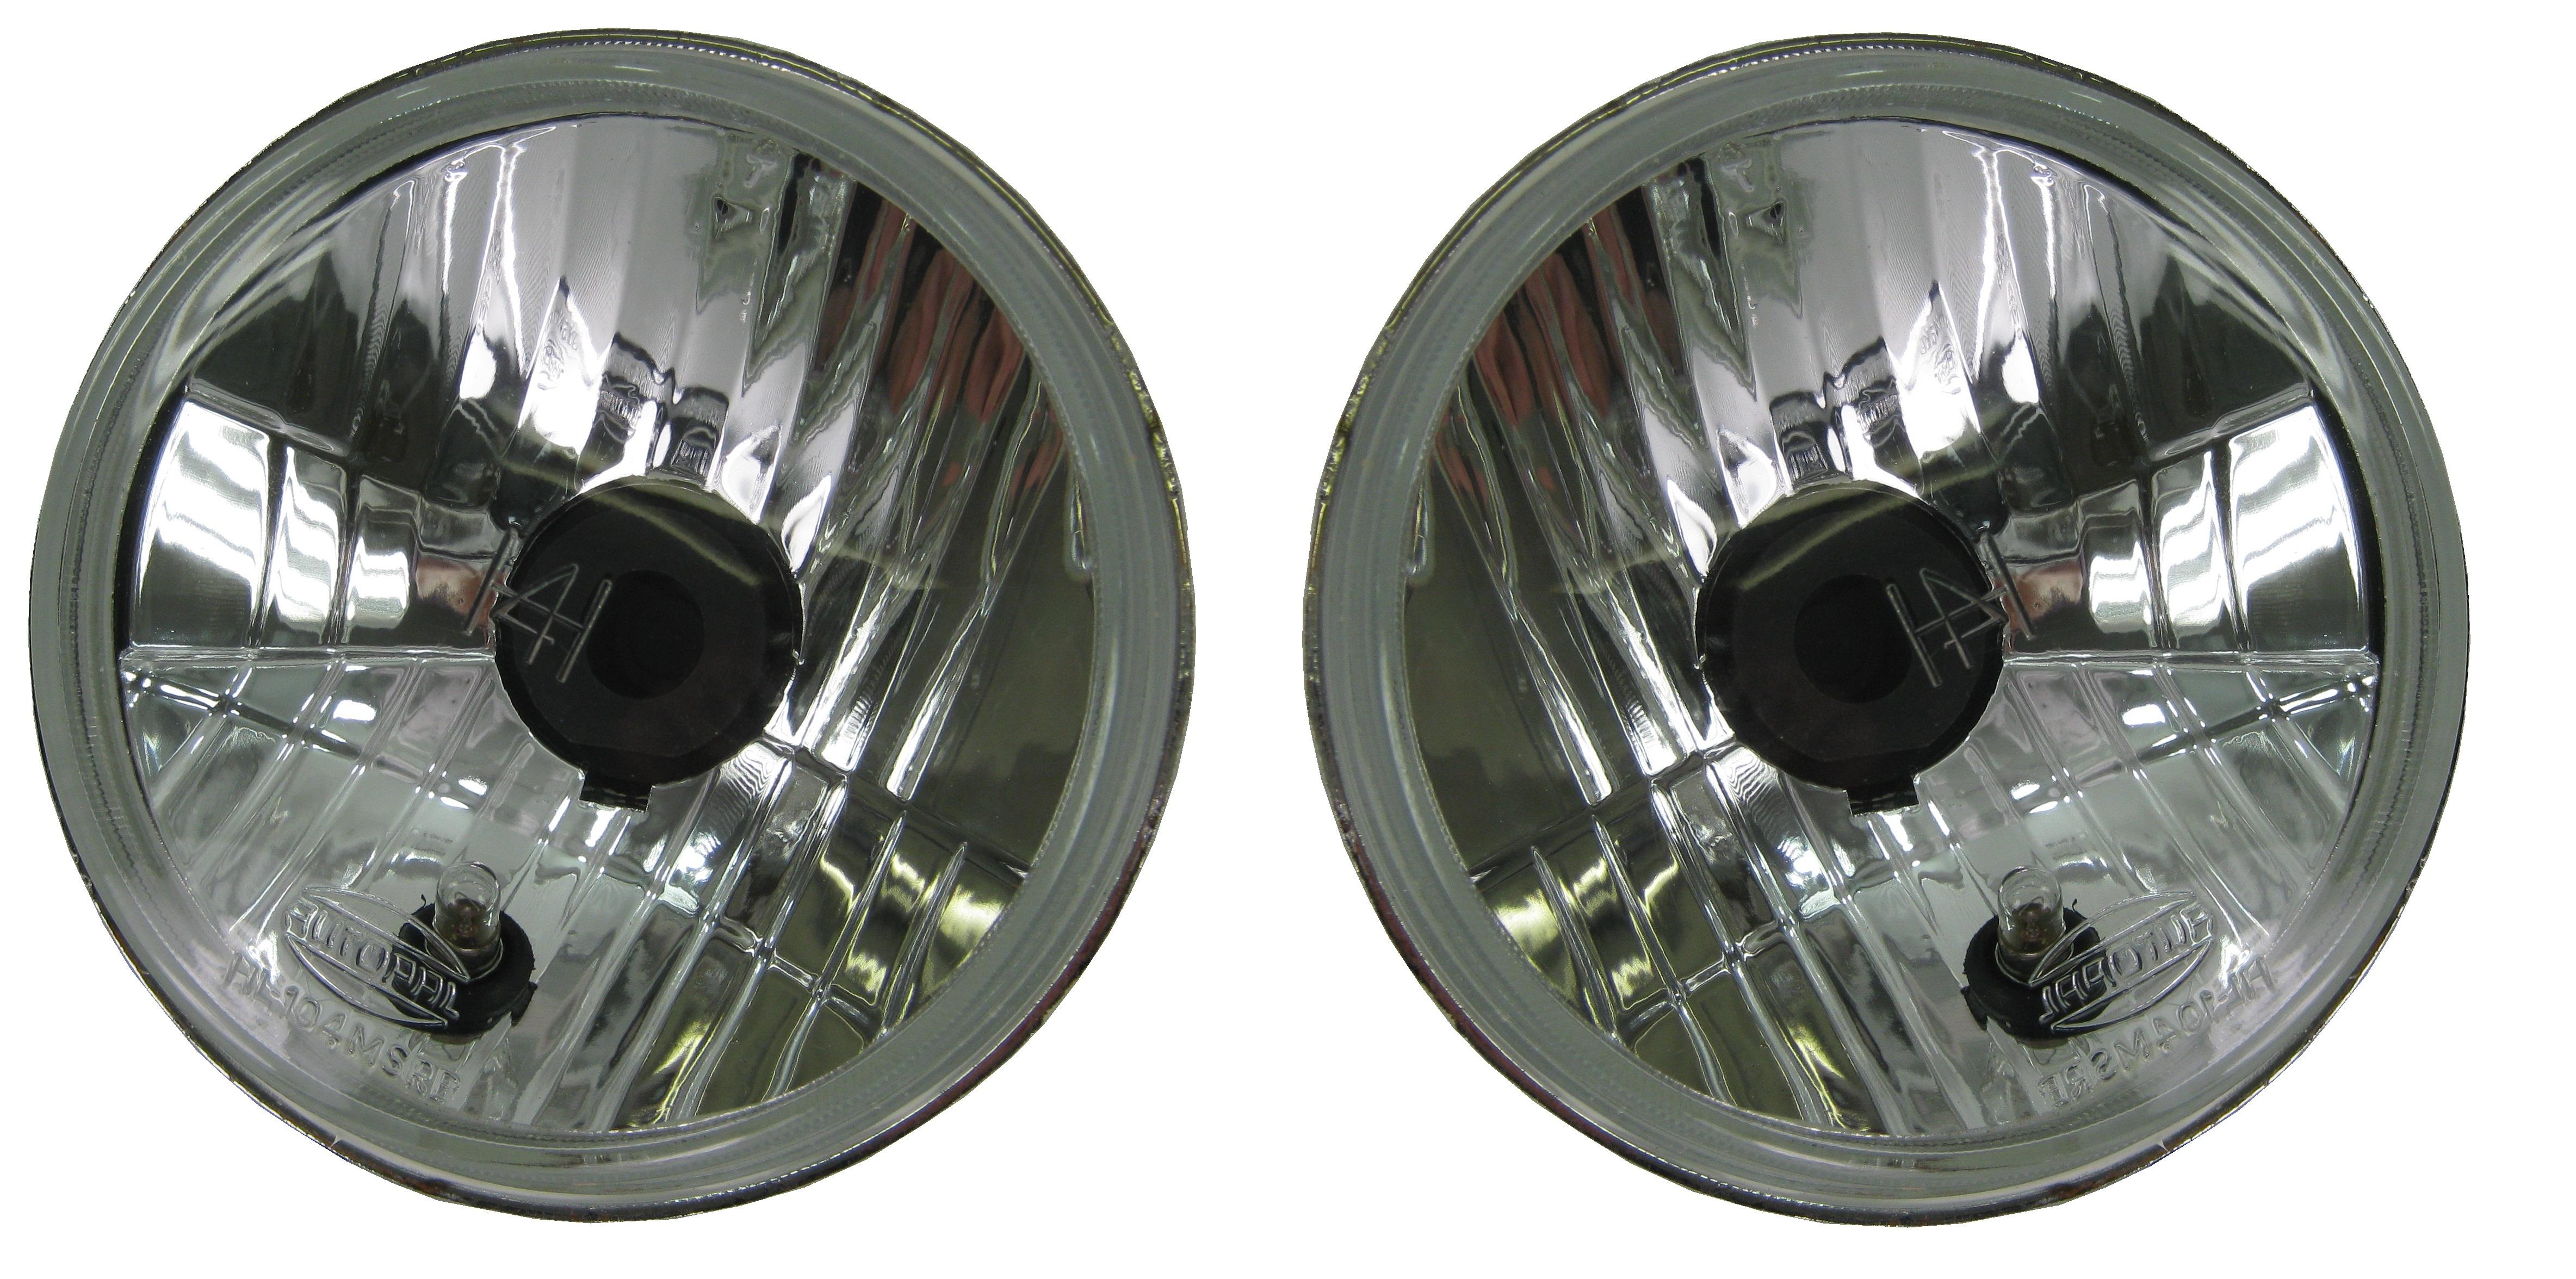 What Cars Use H Bulbs